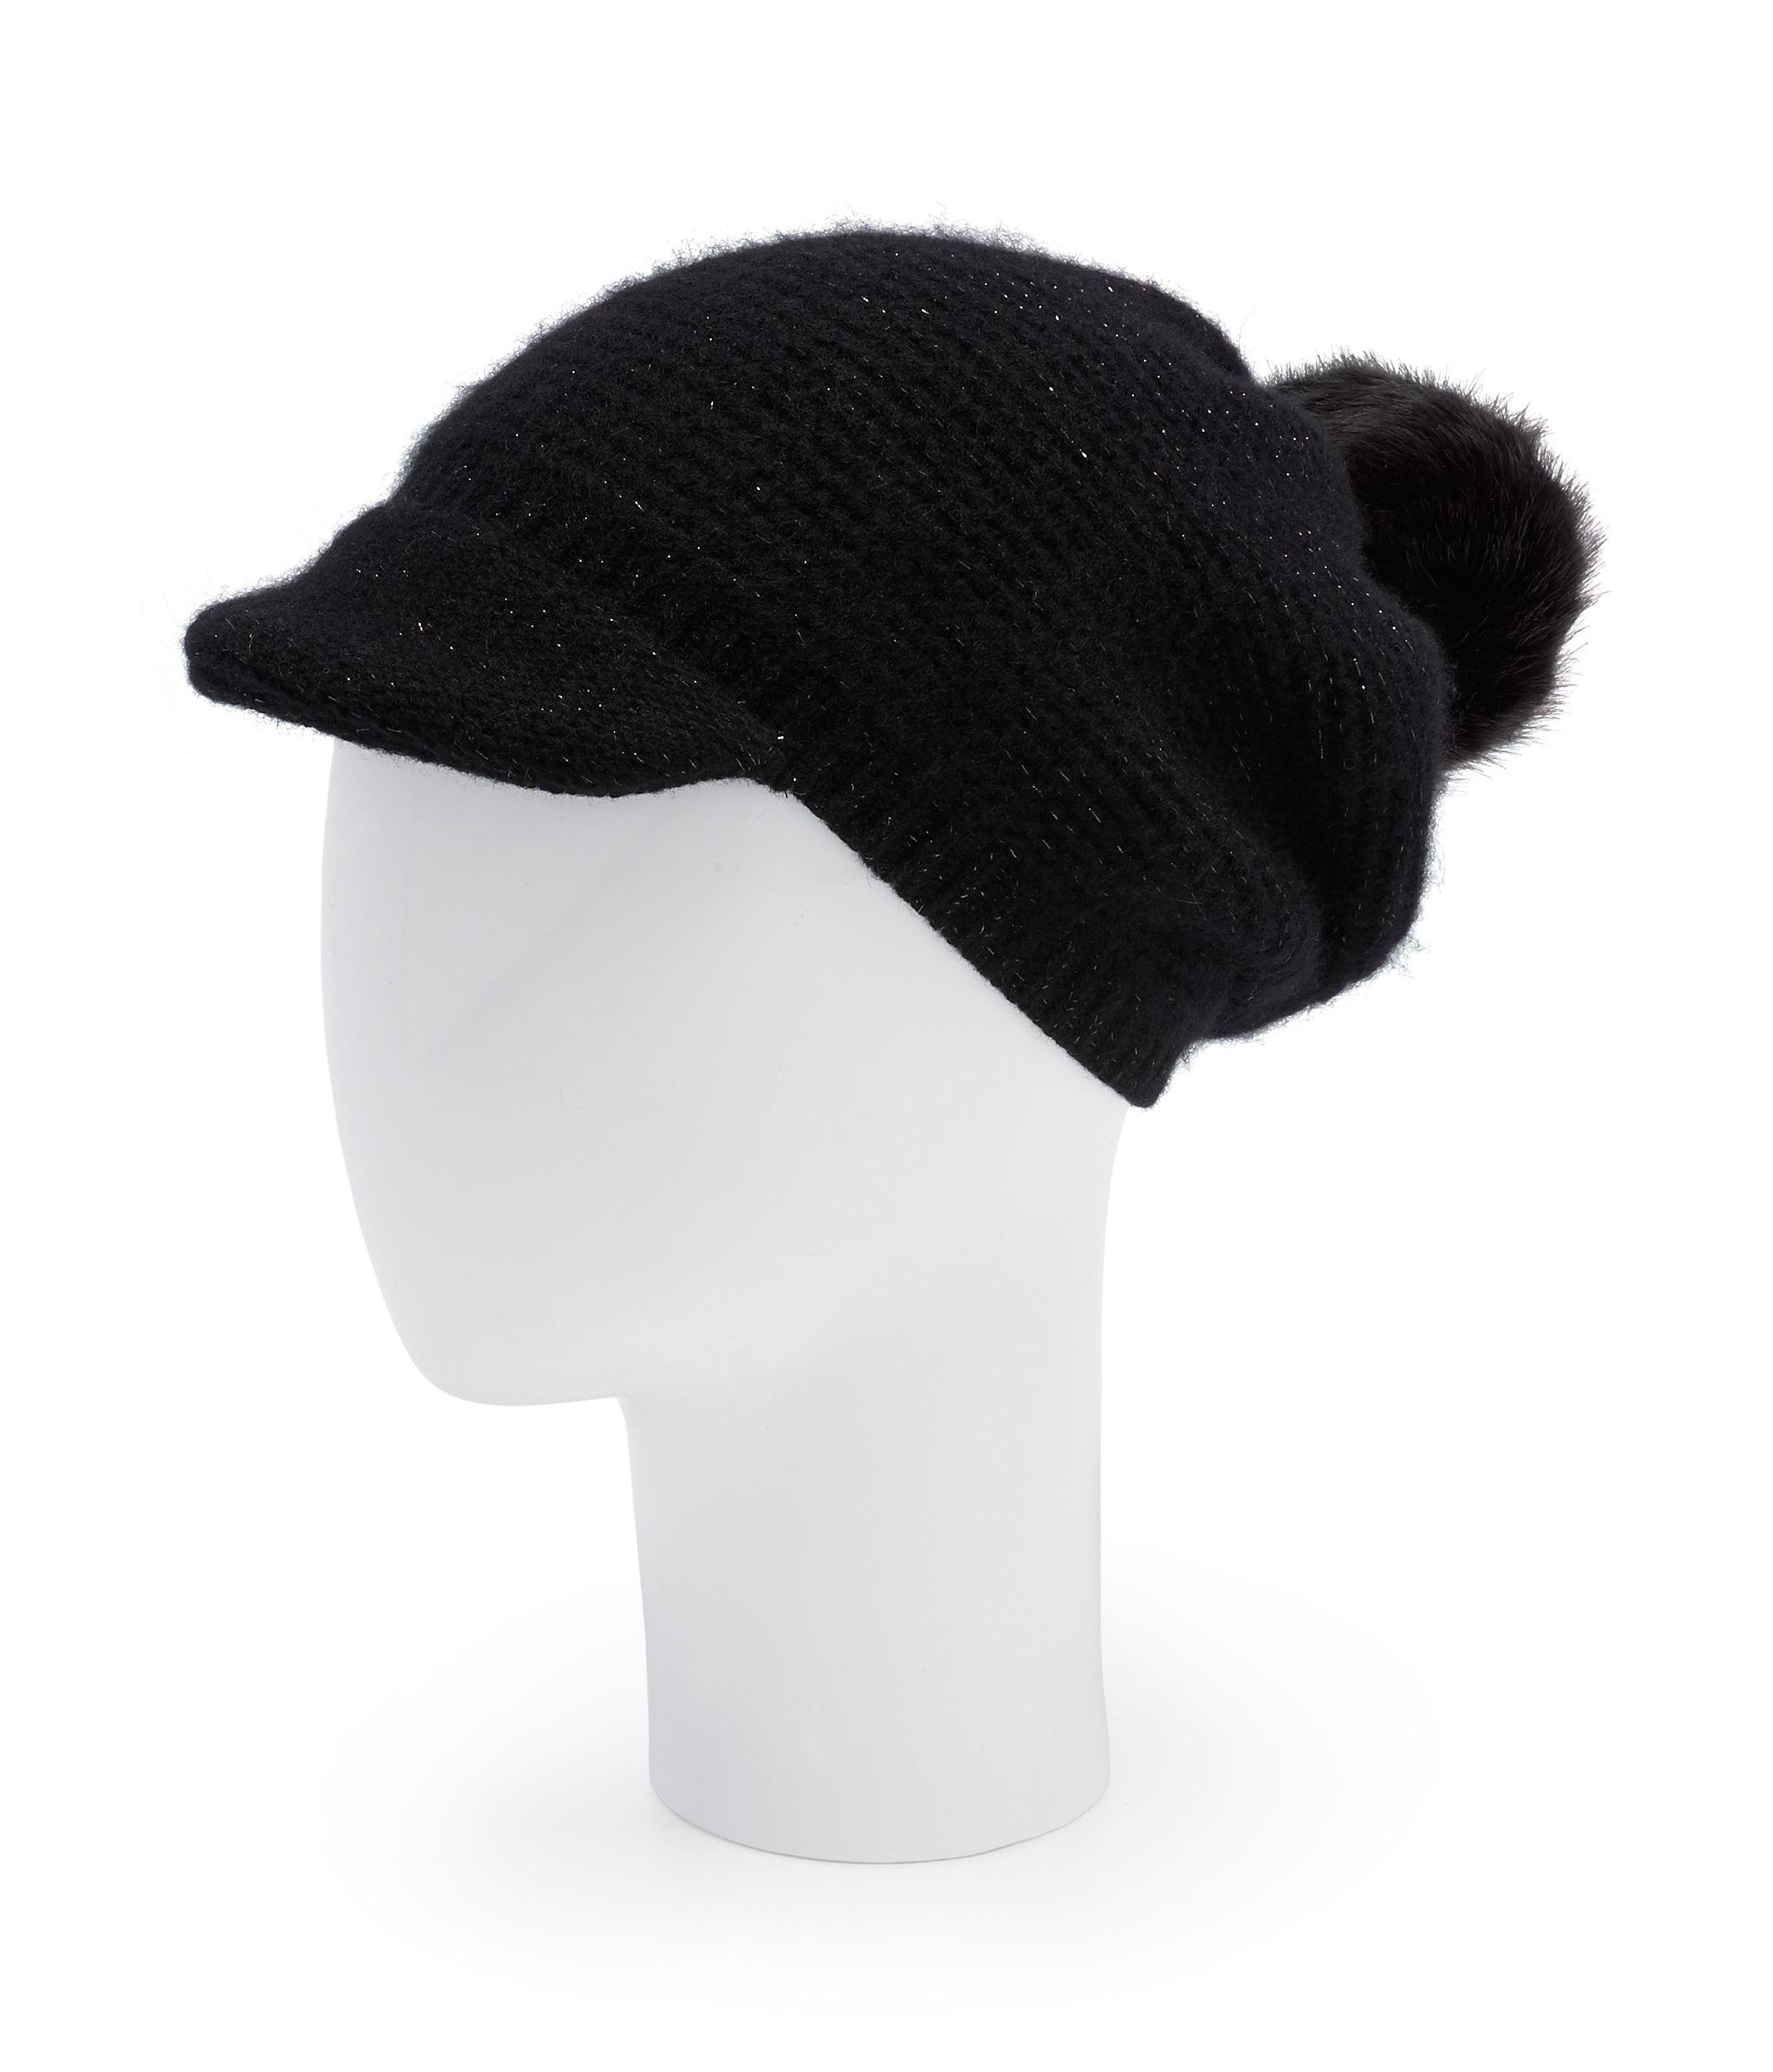 41477bcb2f2 Lyst - Henri Bendel Blake Cashmere Brim Hat in Black